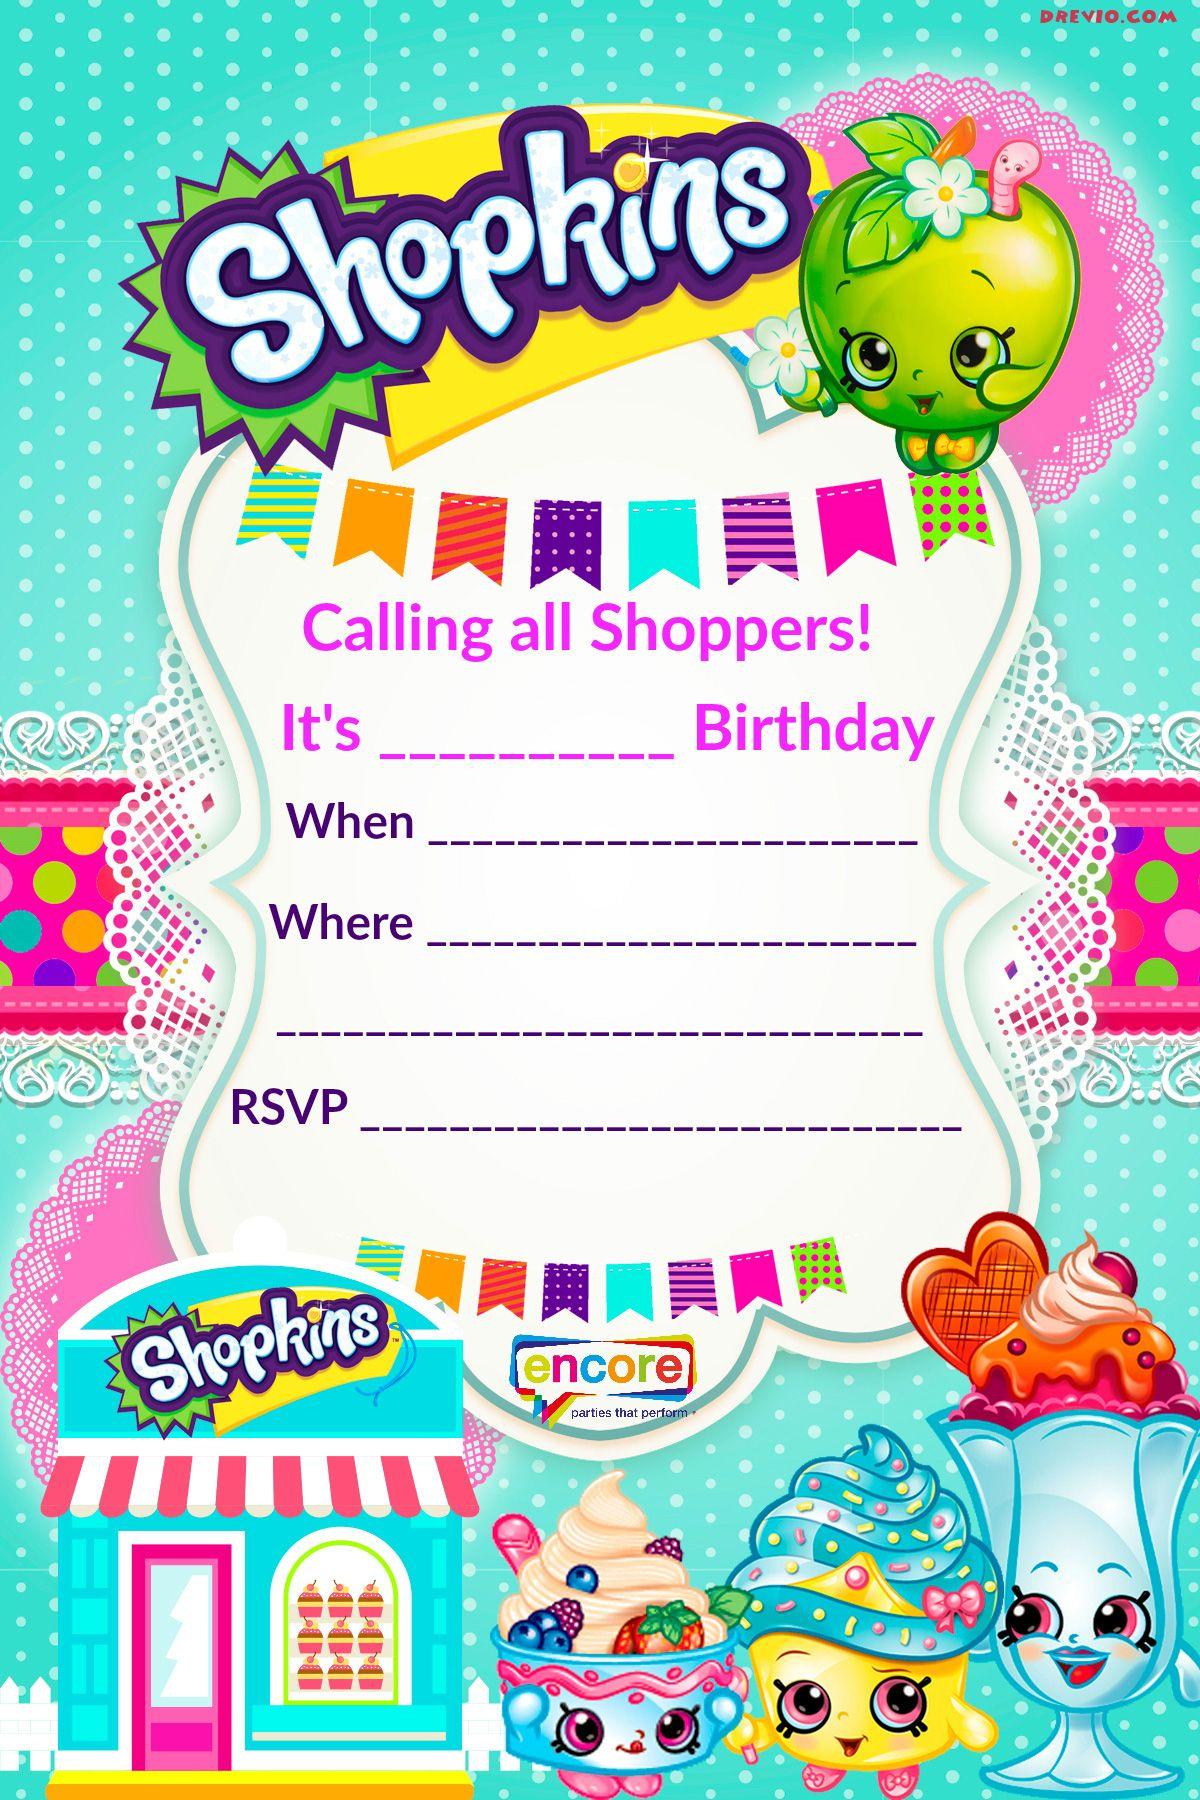 Updated - Free Printable Shopkins Birthday Invitation | Free - Free Printable Birthday Invitation Templates